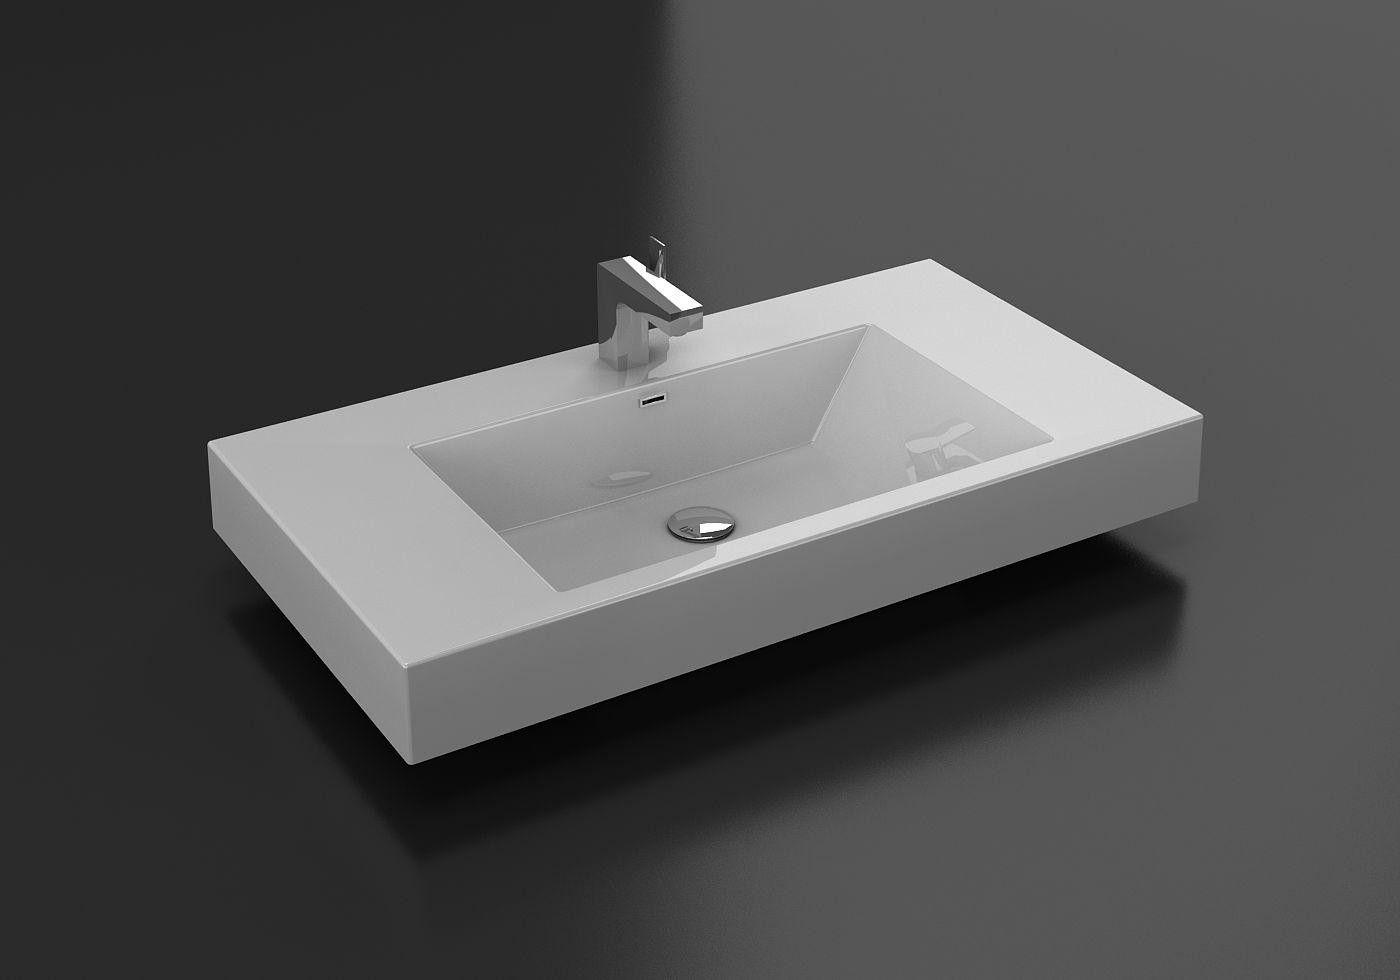 Aqua Decor Venice 36 Inch Bathroom Vessel Sink Sink Basin